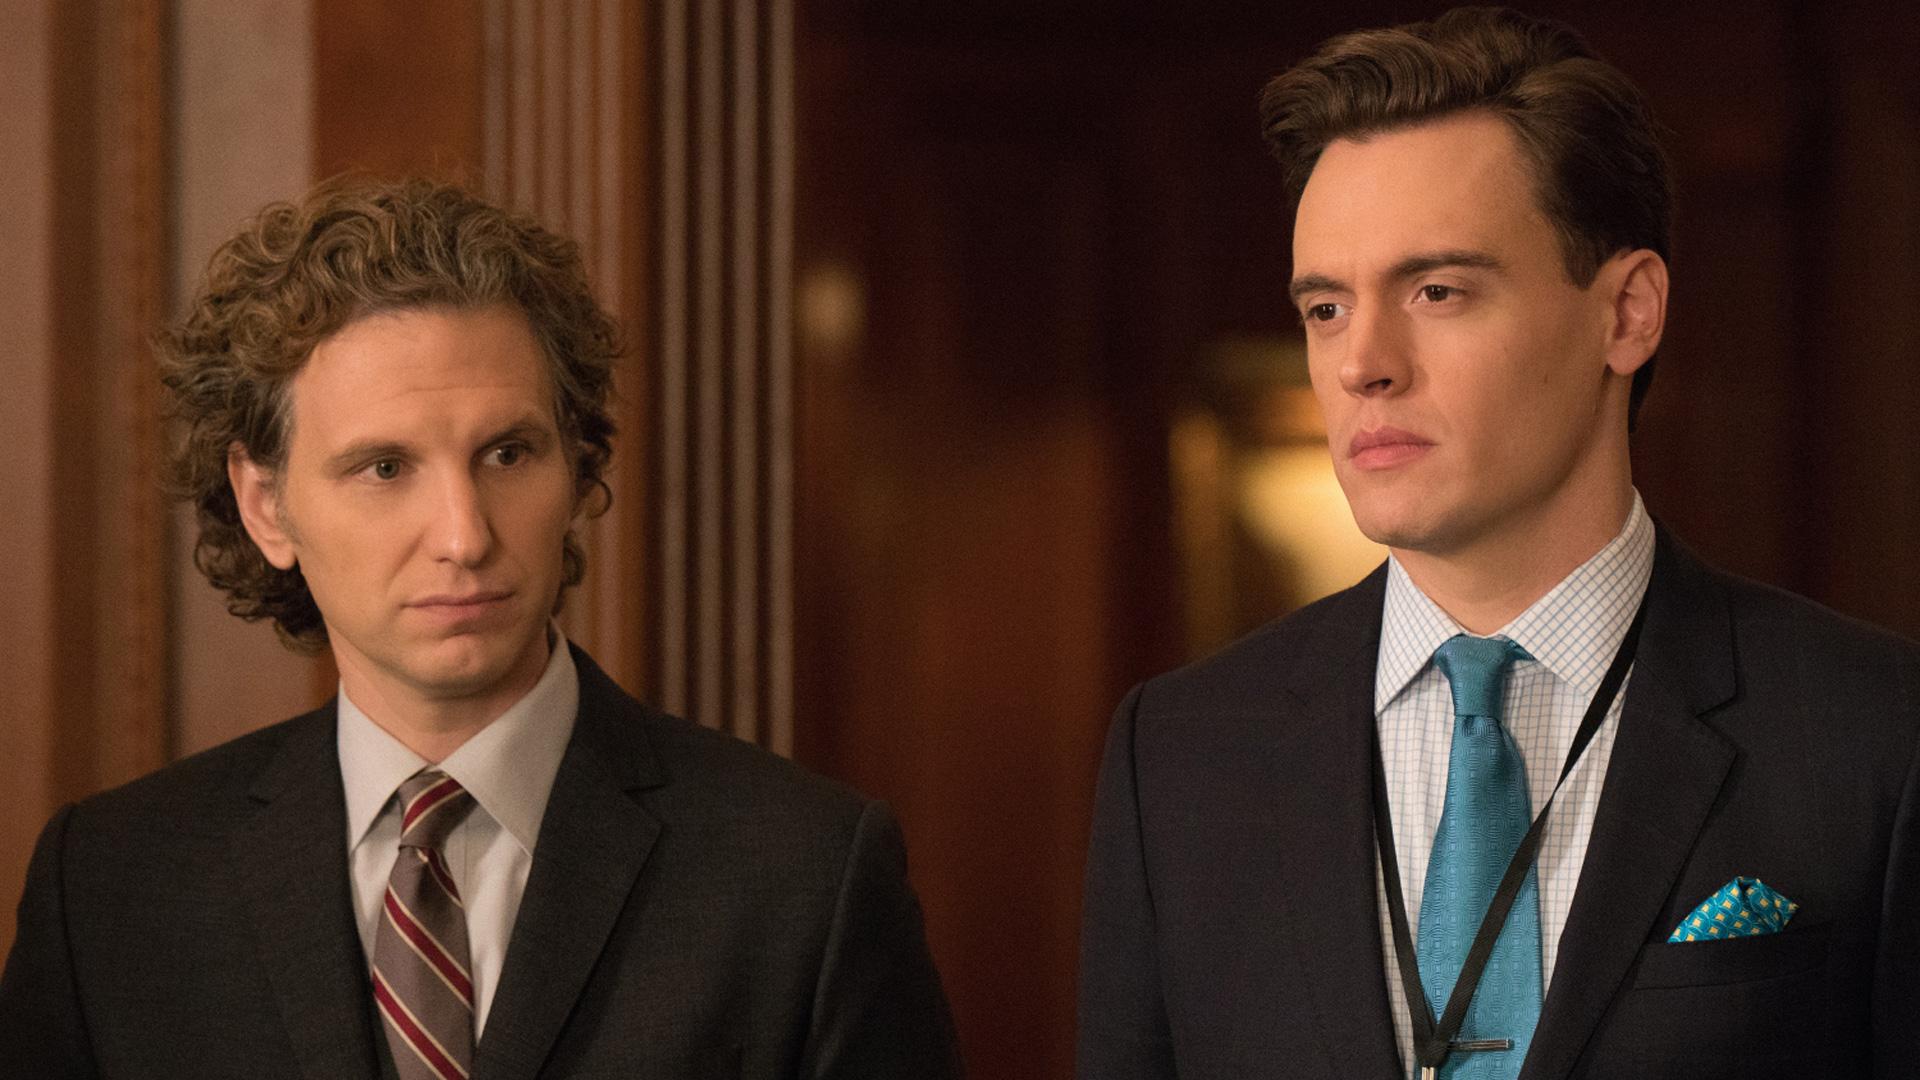 Sebastian and Erich Bergen (Blake Moran) look serious.